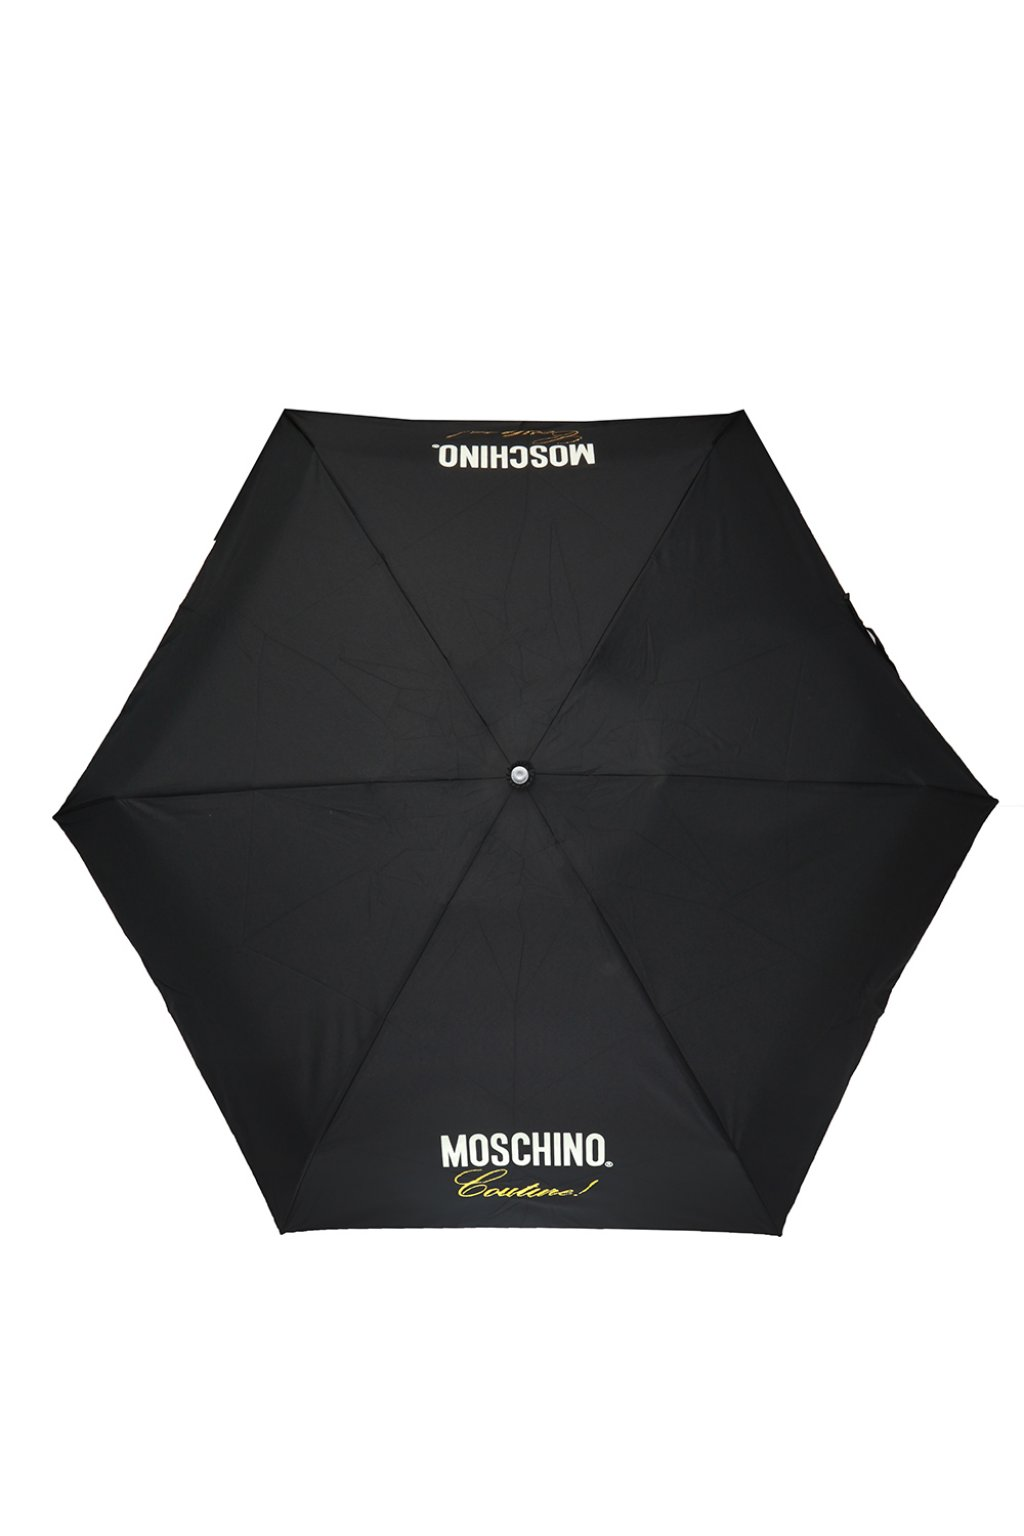 Moschino Umbrella with case